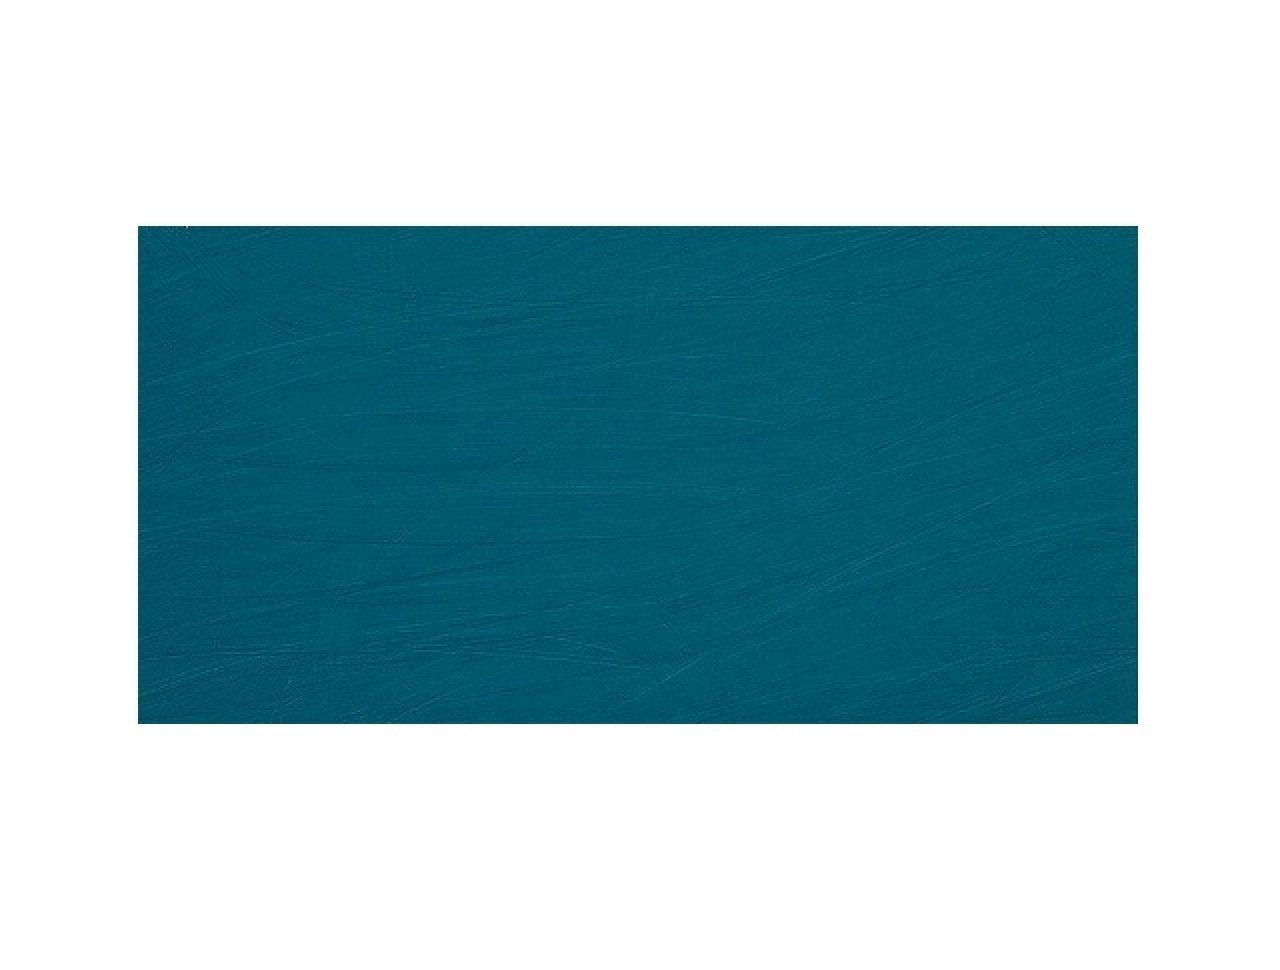 Настенная плитка Magnifique Ottanio 40x80